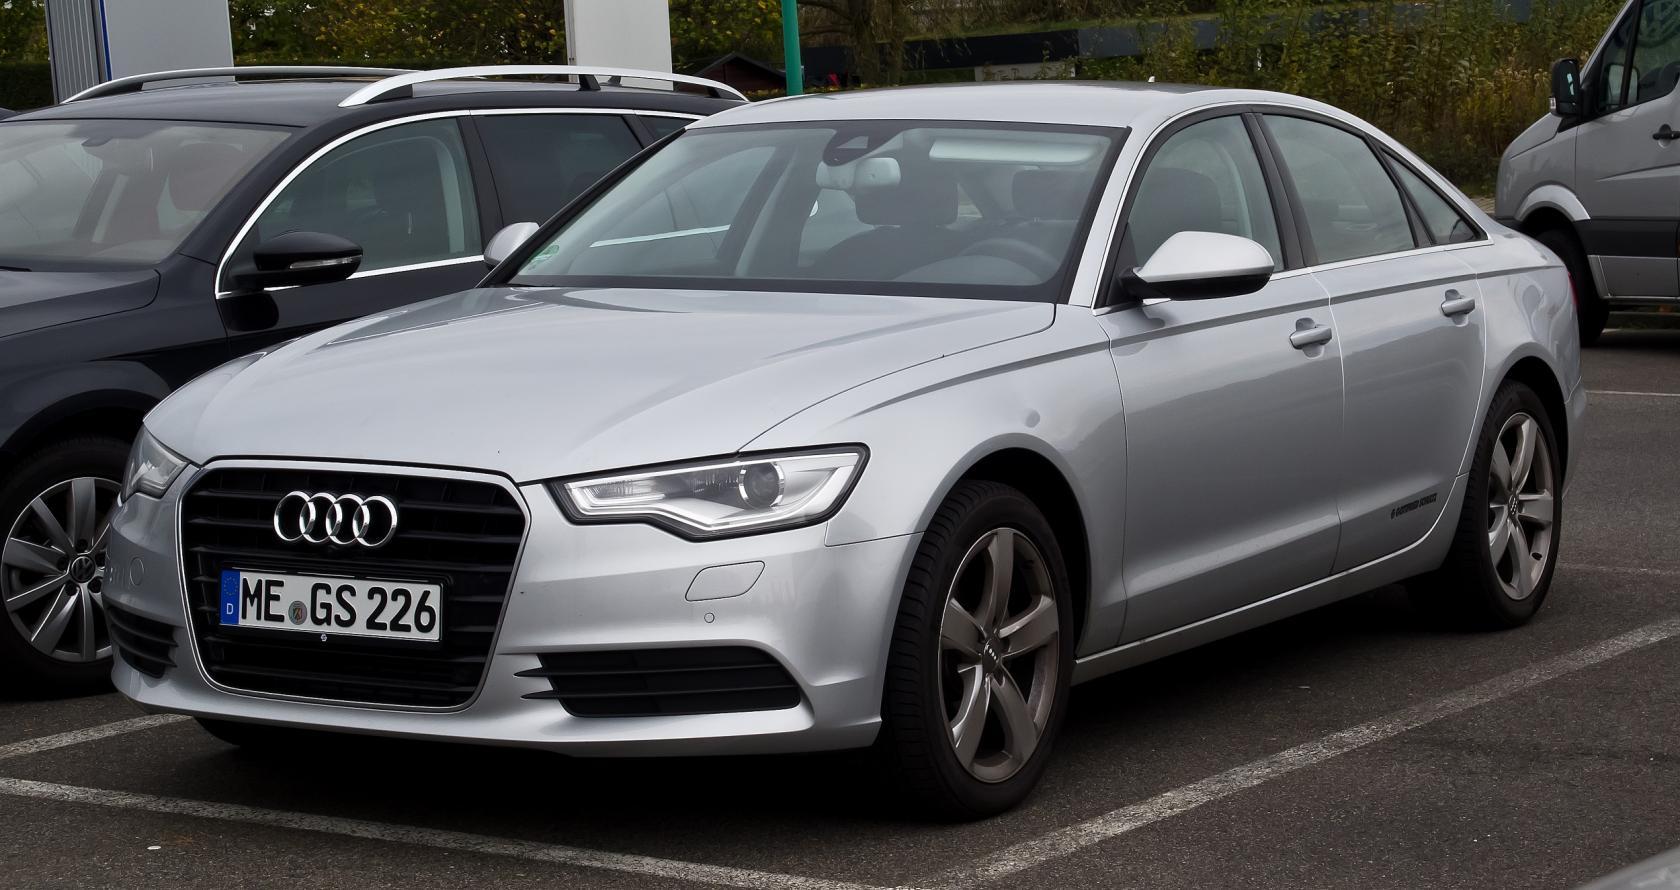 Audi-A6-C7-2